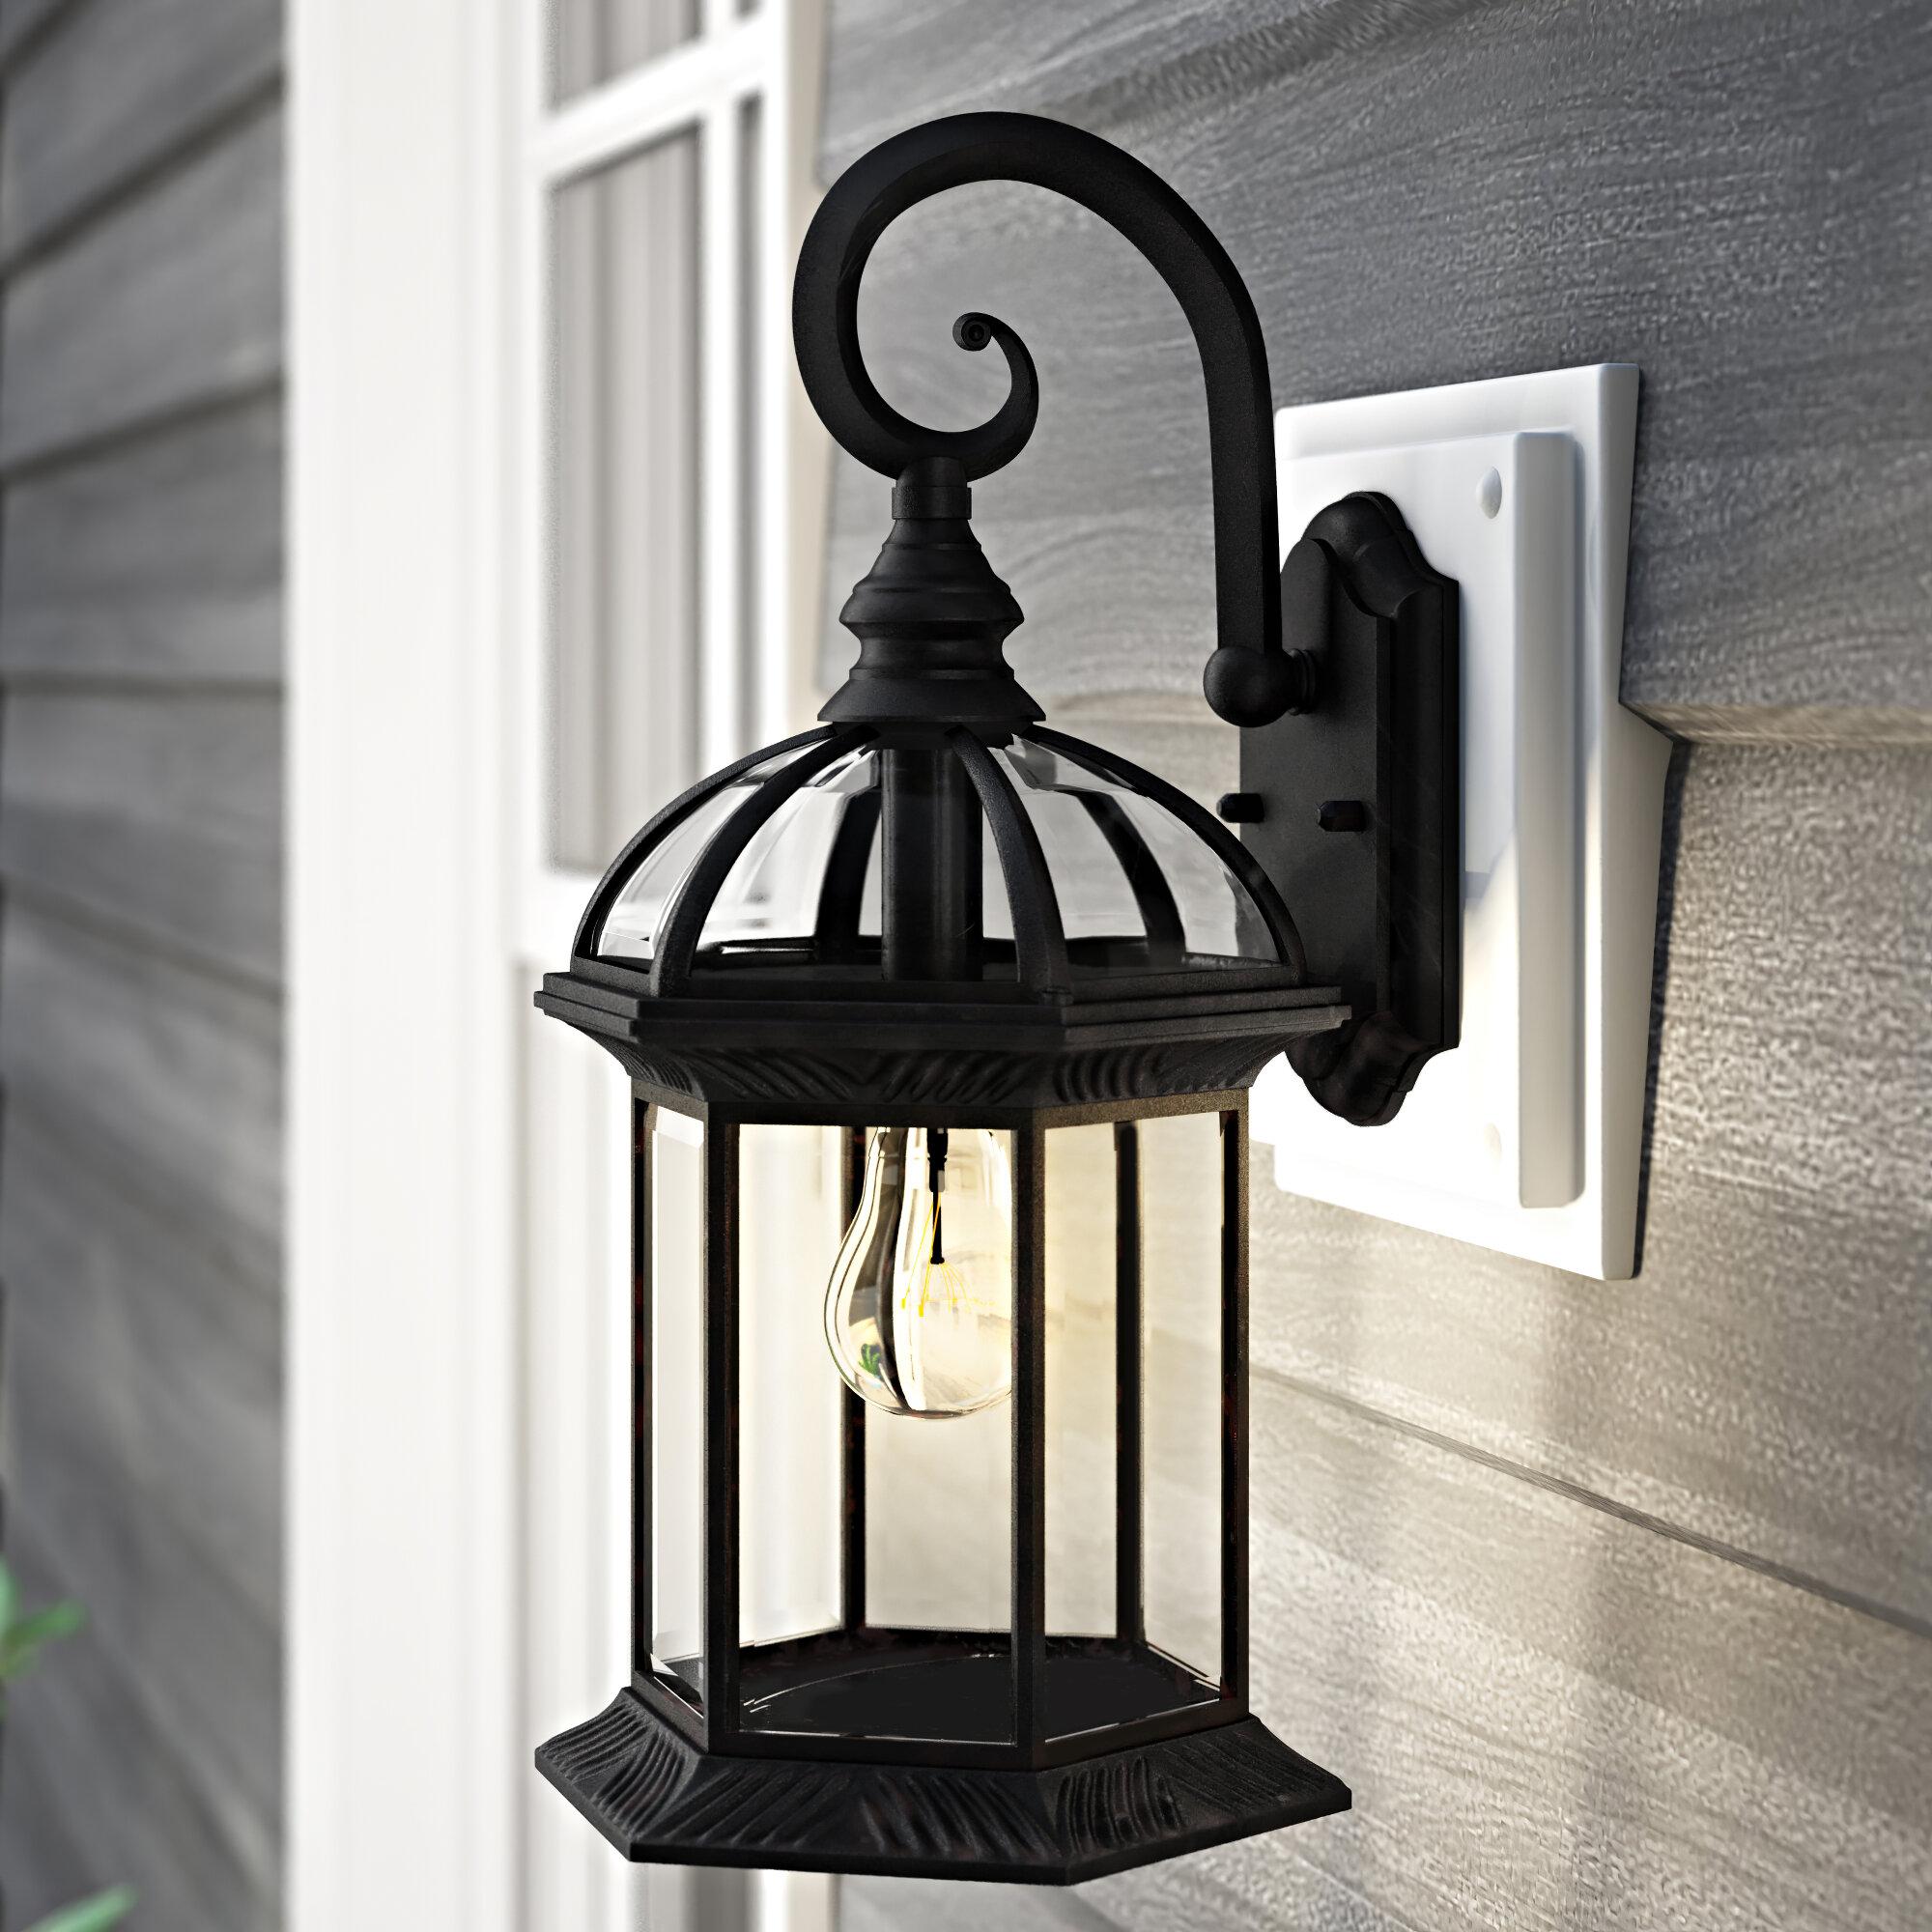 Laurel Foundry Modern Farmhouse Powell Outdoor Wall Lantern